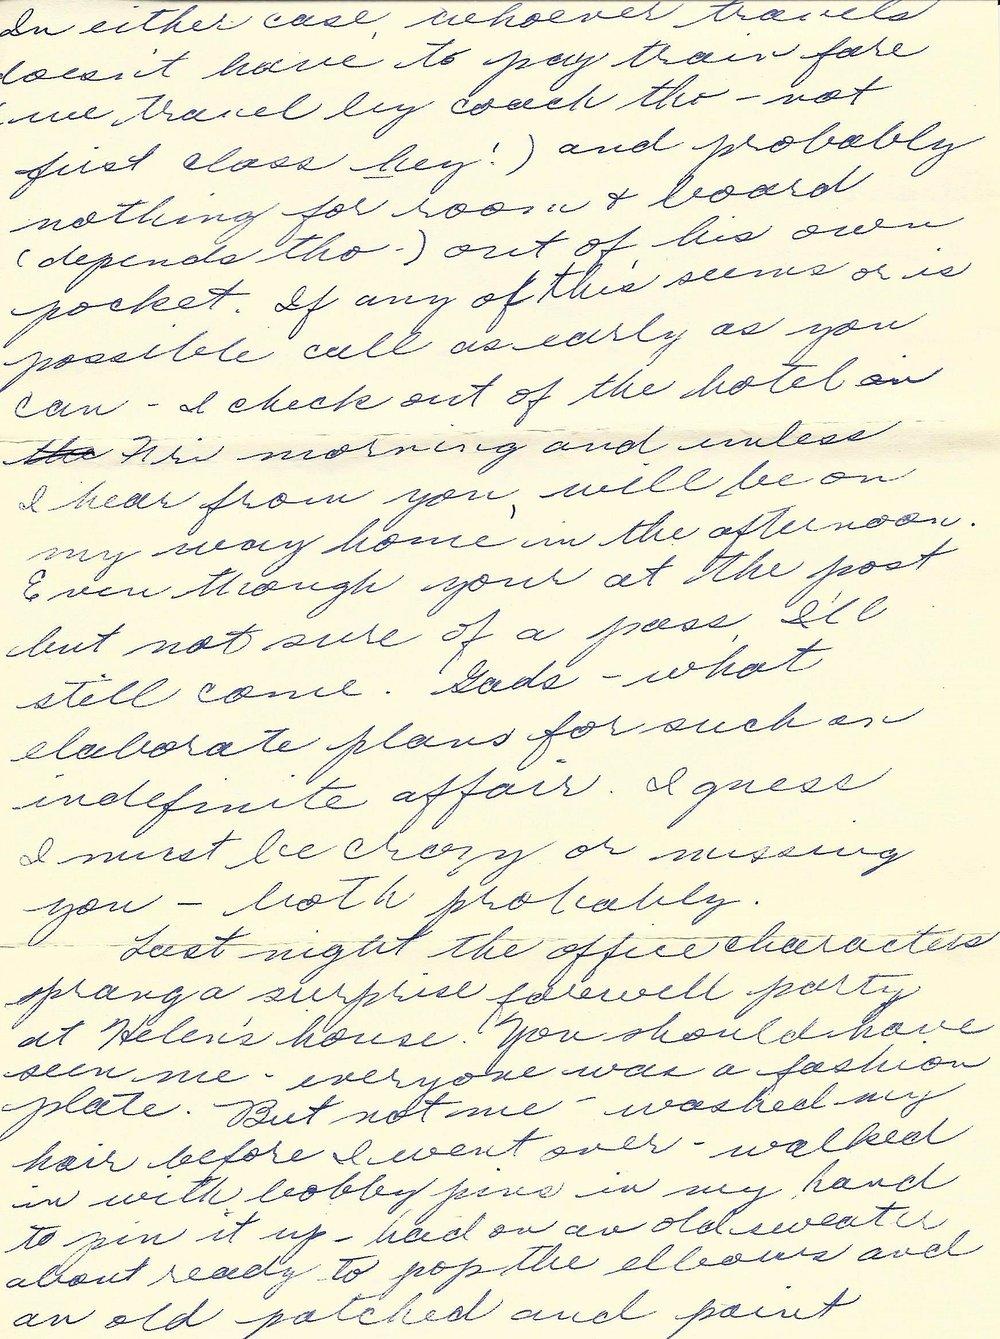 2. Oct. 3, 1952 (Oma)_Page_4.jpg